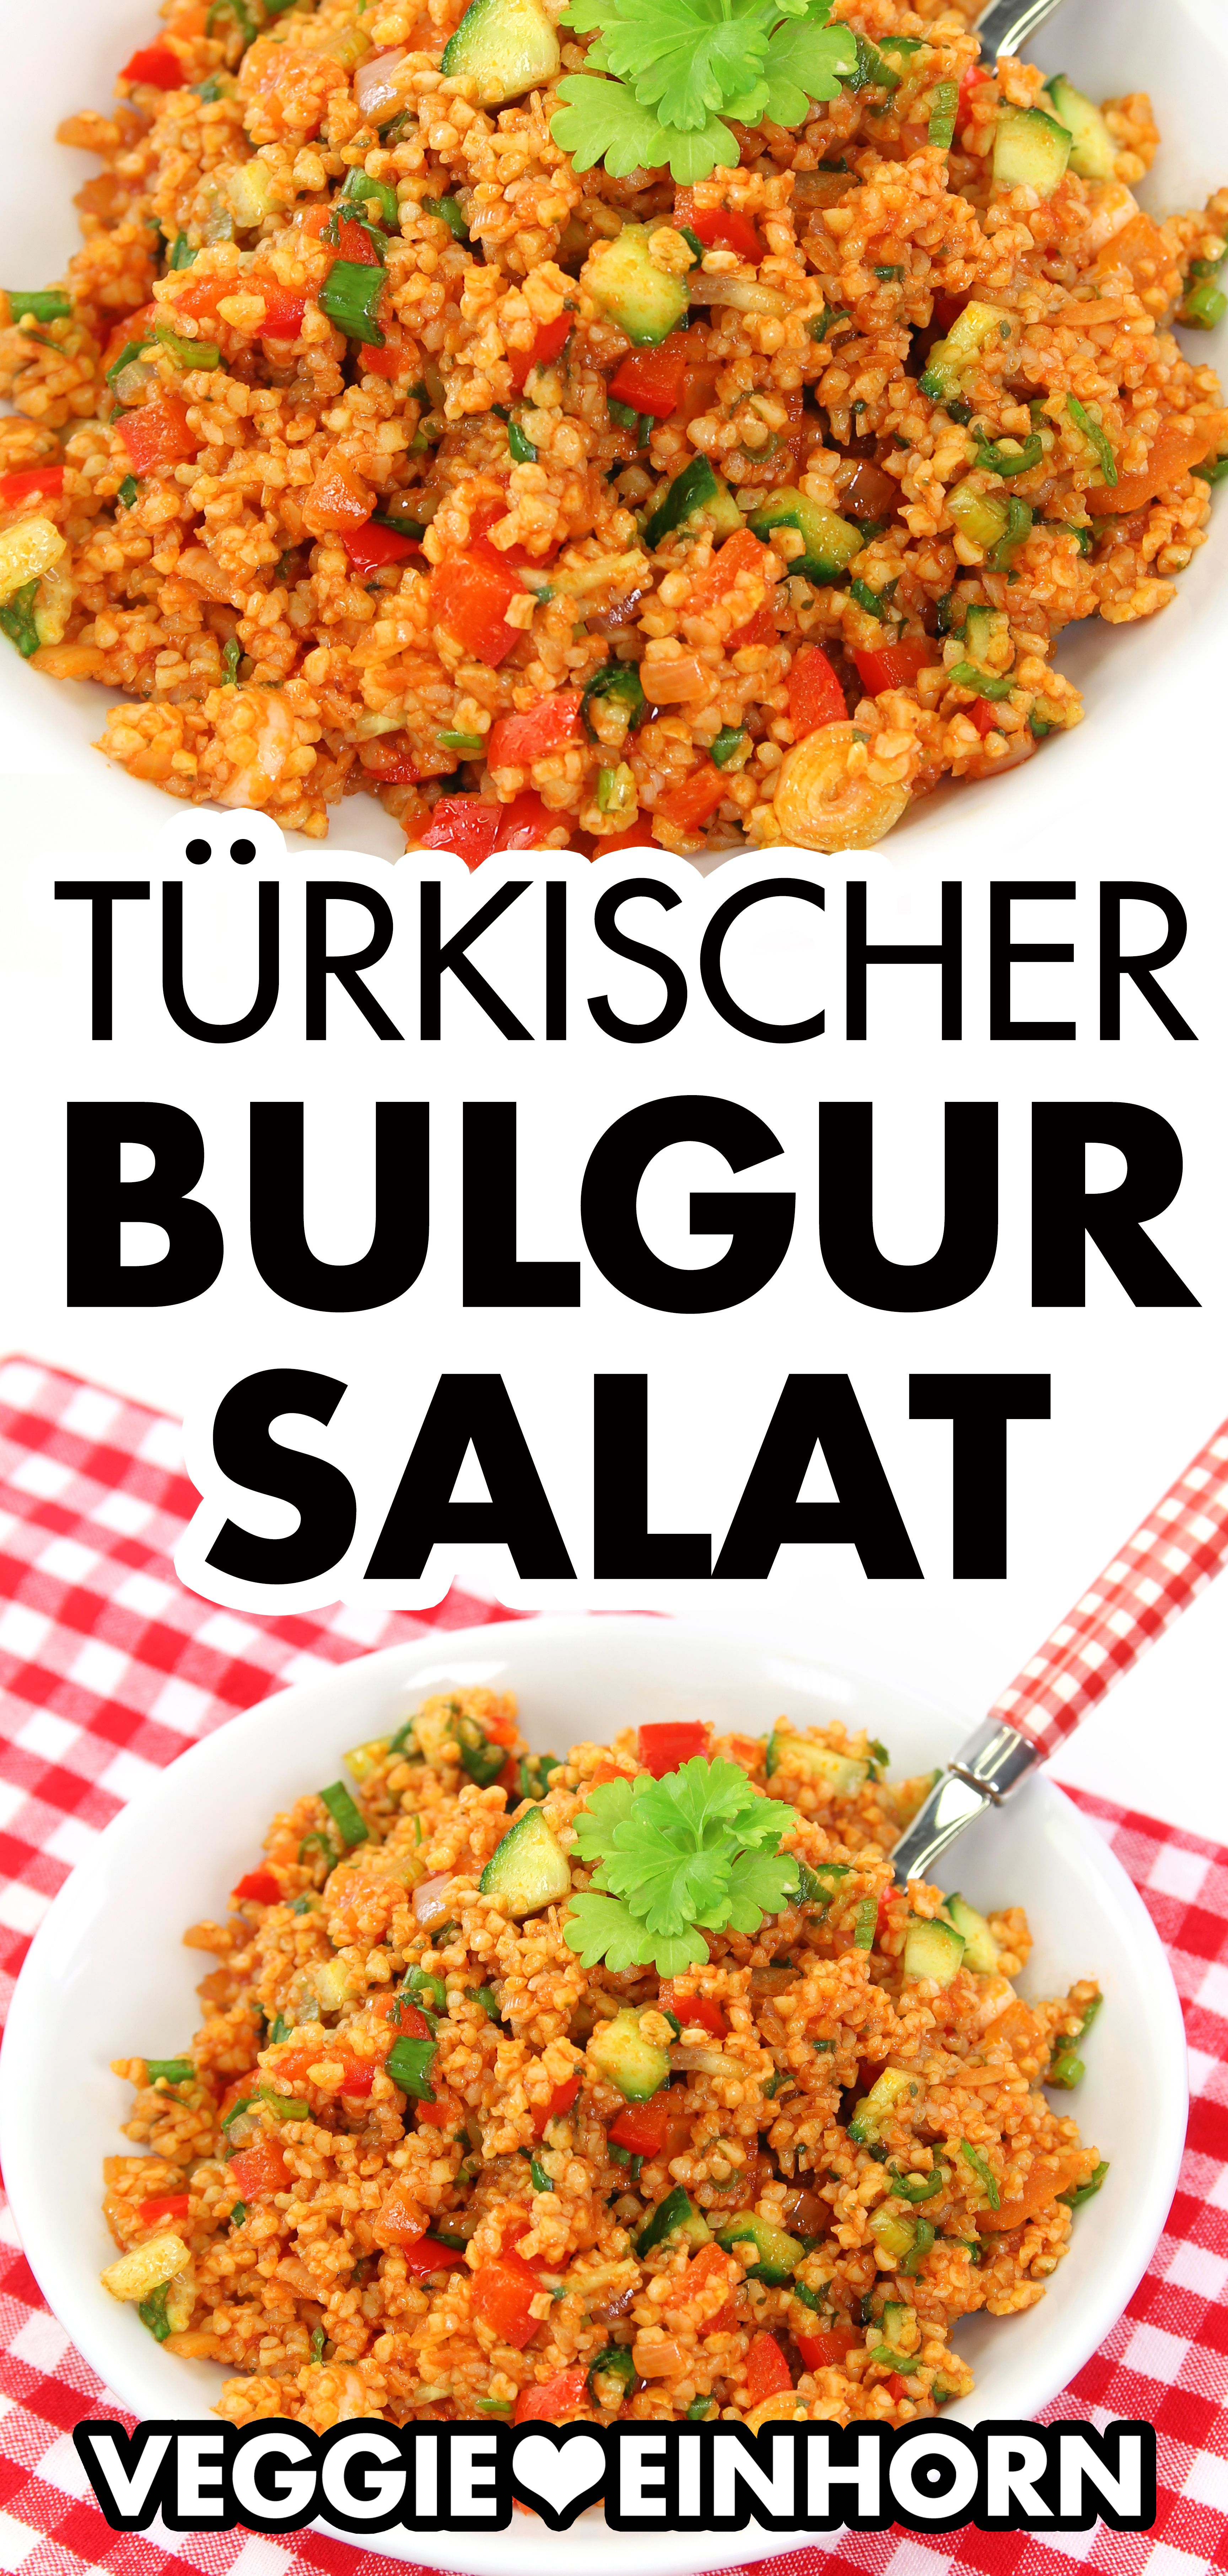 Vegetarischer Bulgur Salat | Einfacher Bulgursalat auf türkische Art